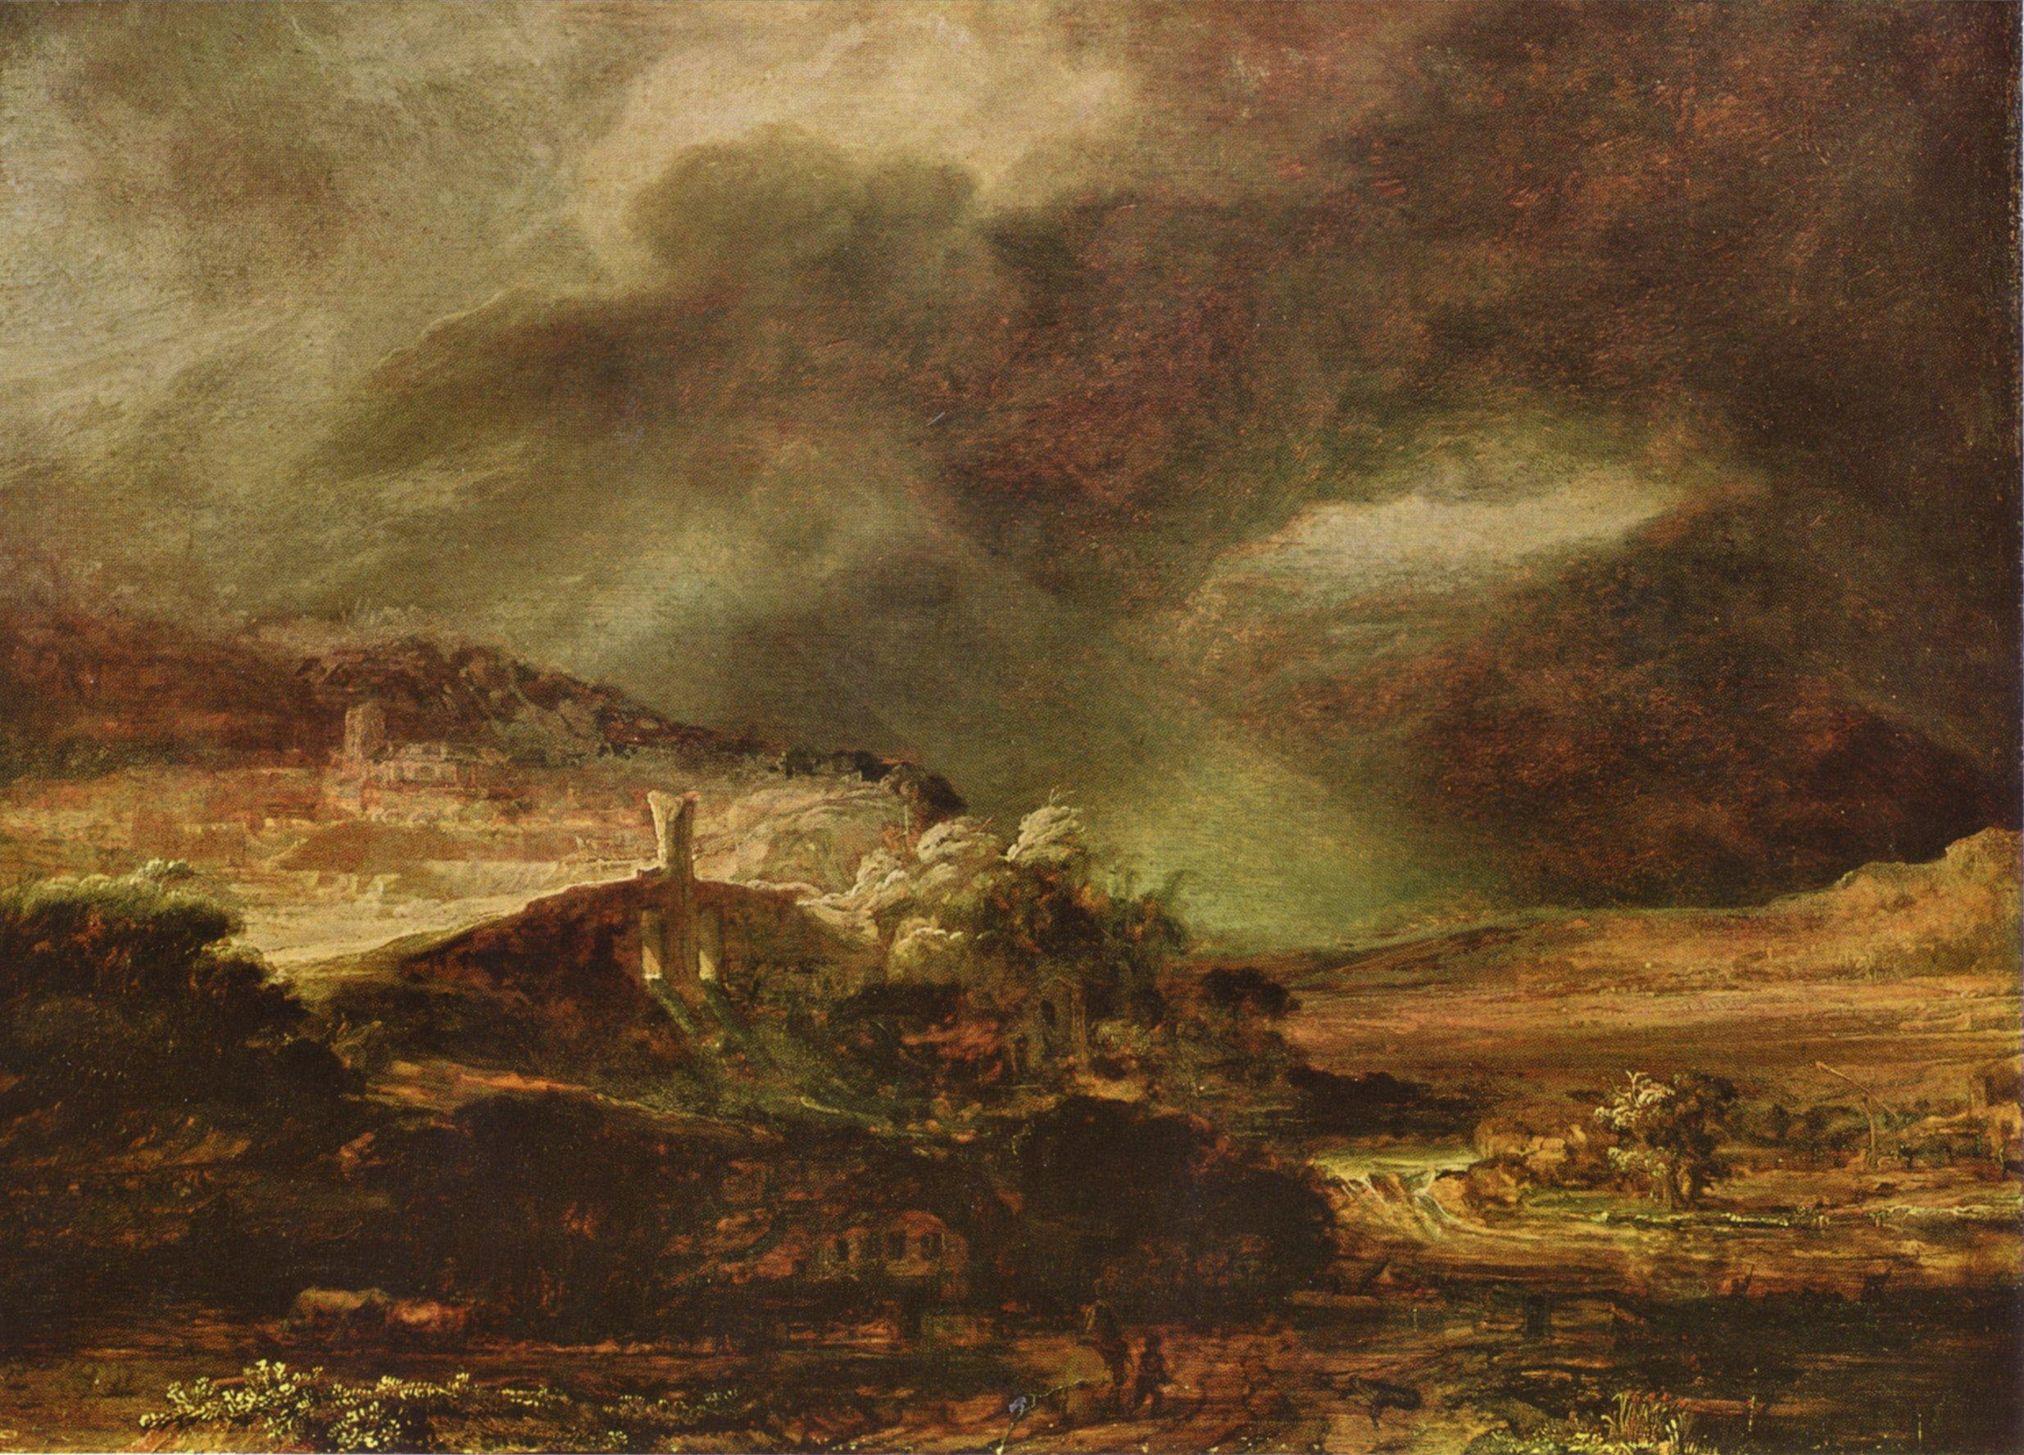 ������� < ����� �� ����� ��� ������������� ����� > :: ������� ��� ���� ��������� - Rembrandt (���������) ����